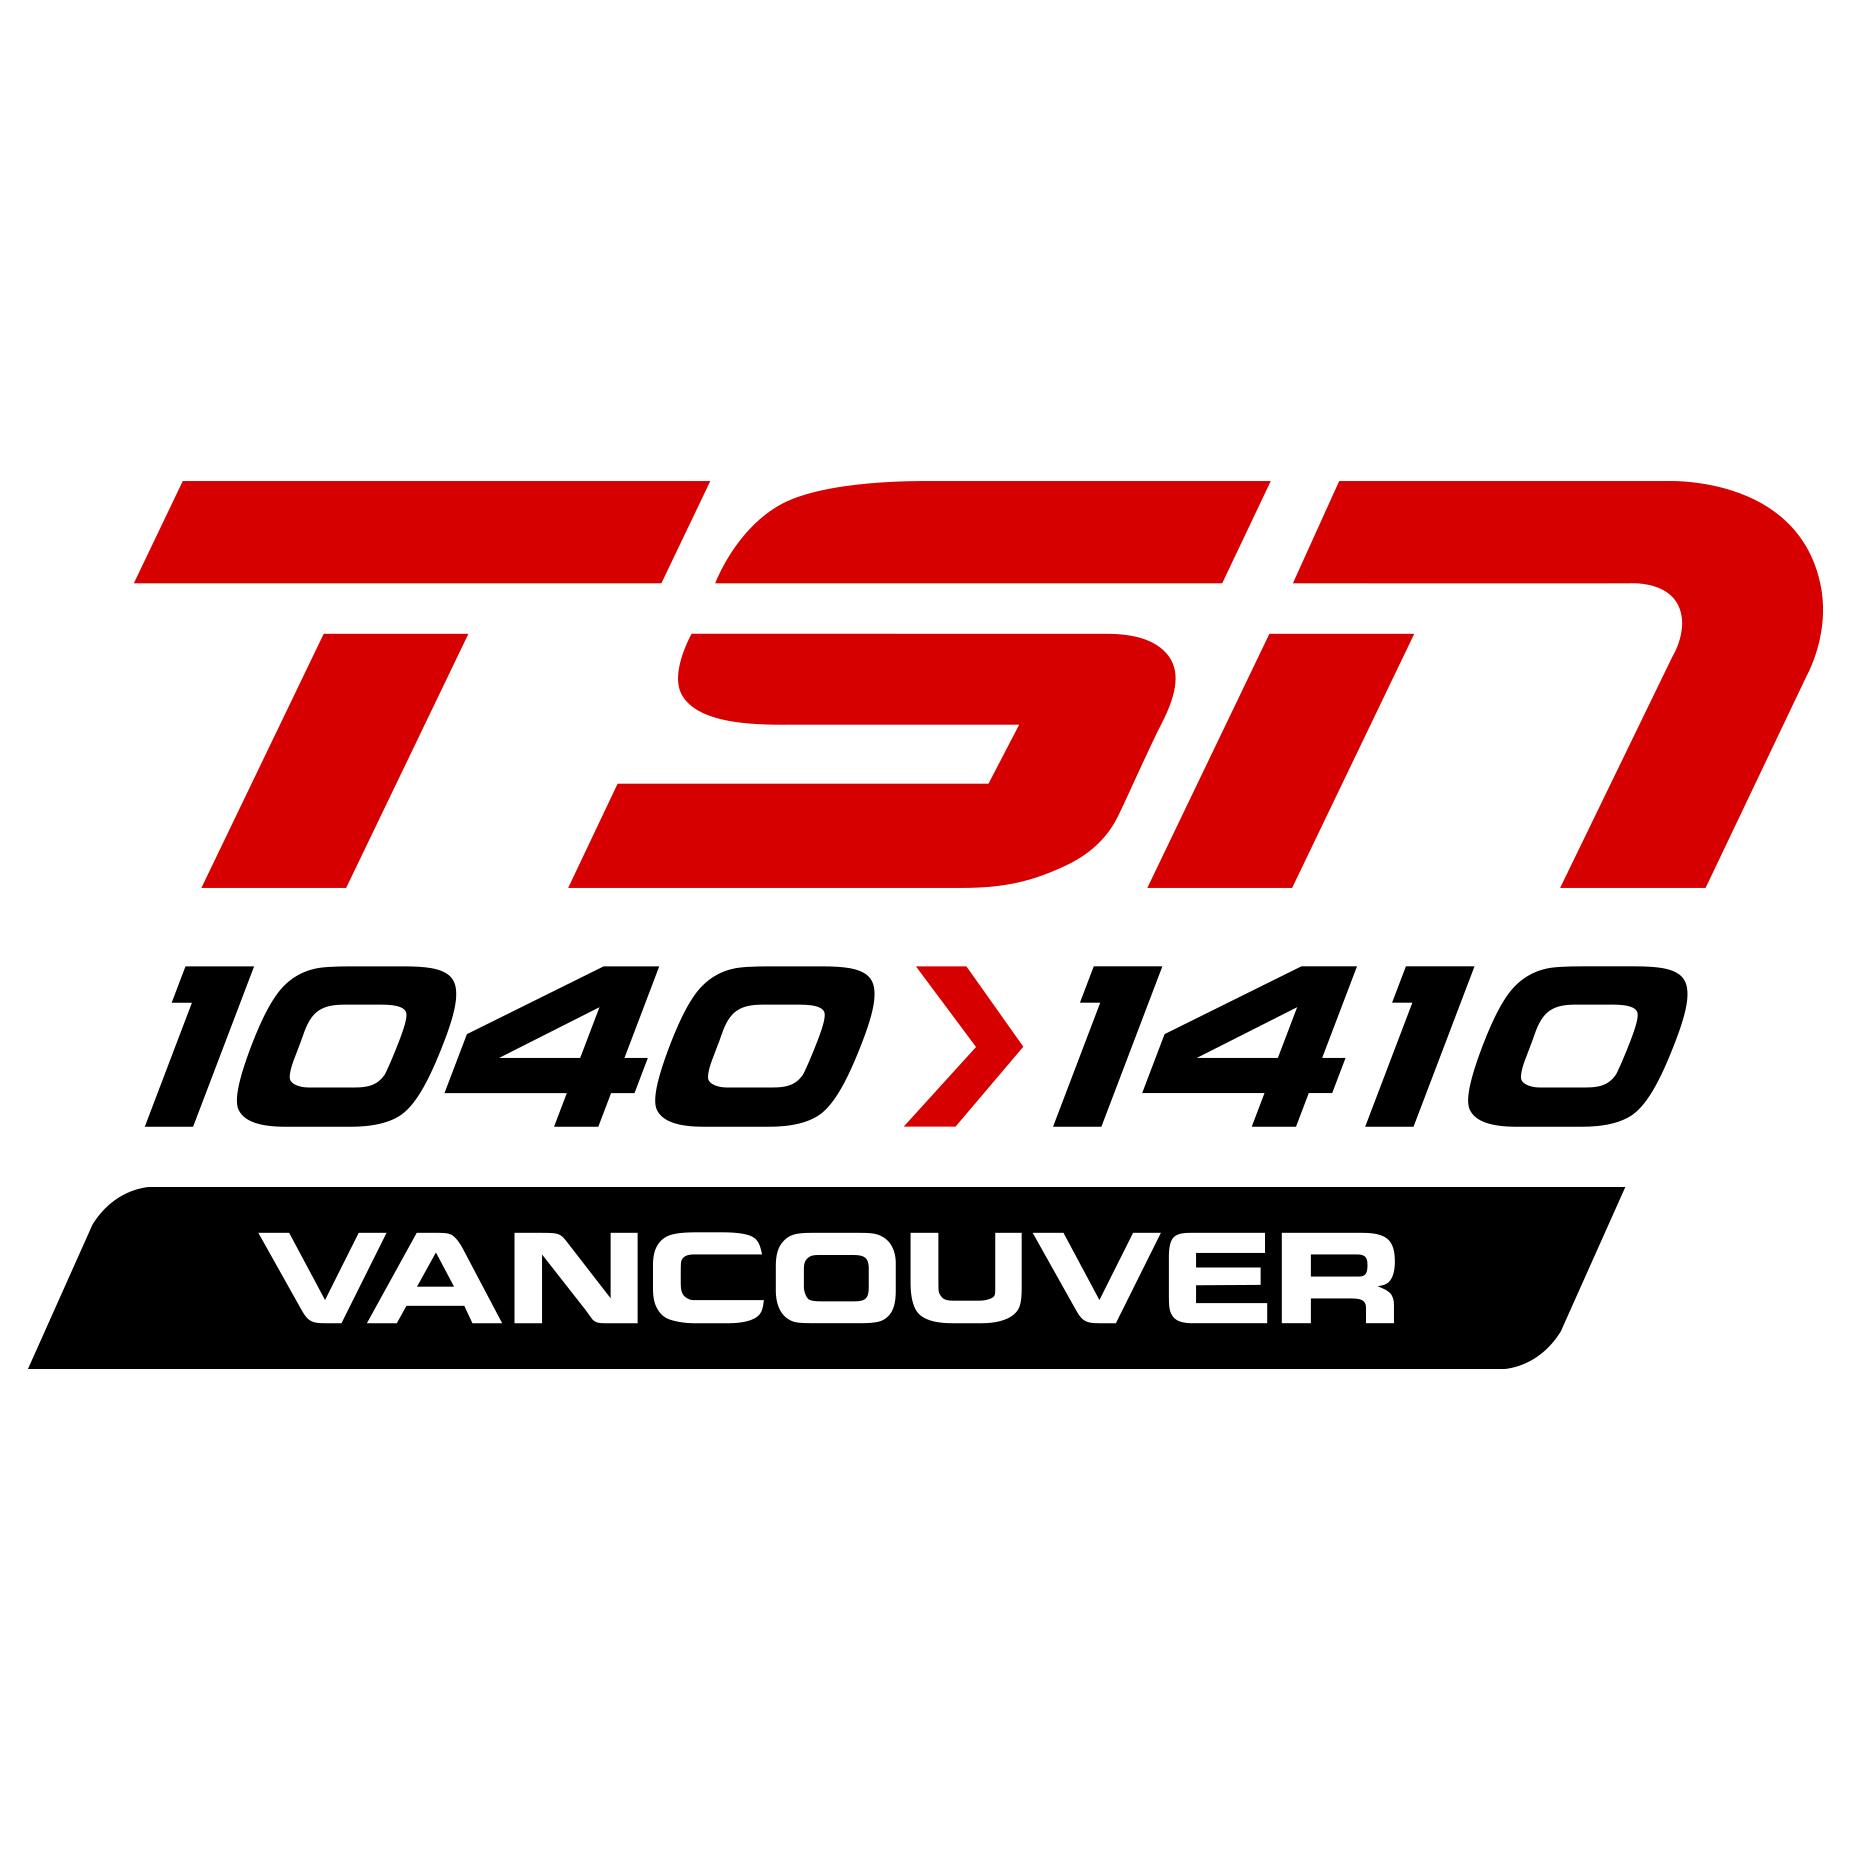 TSN 1040: BC Lions Football Games